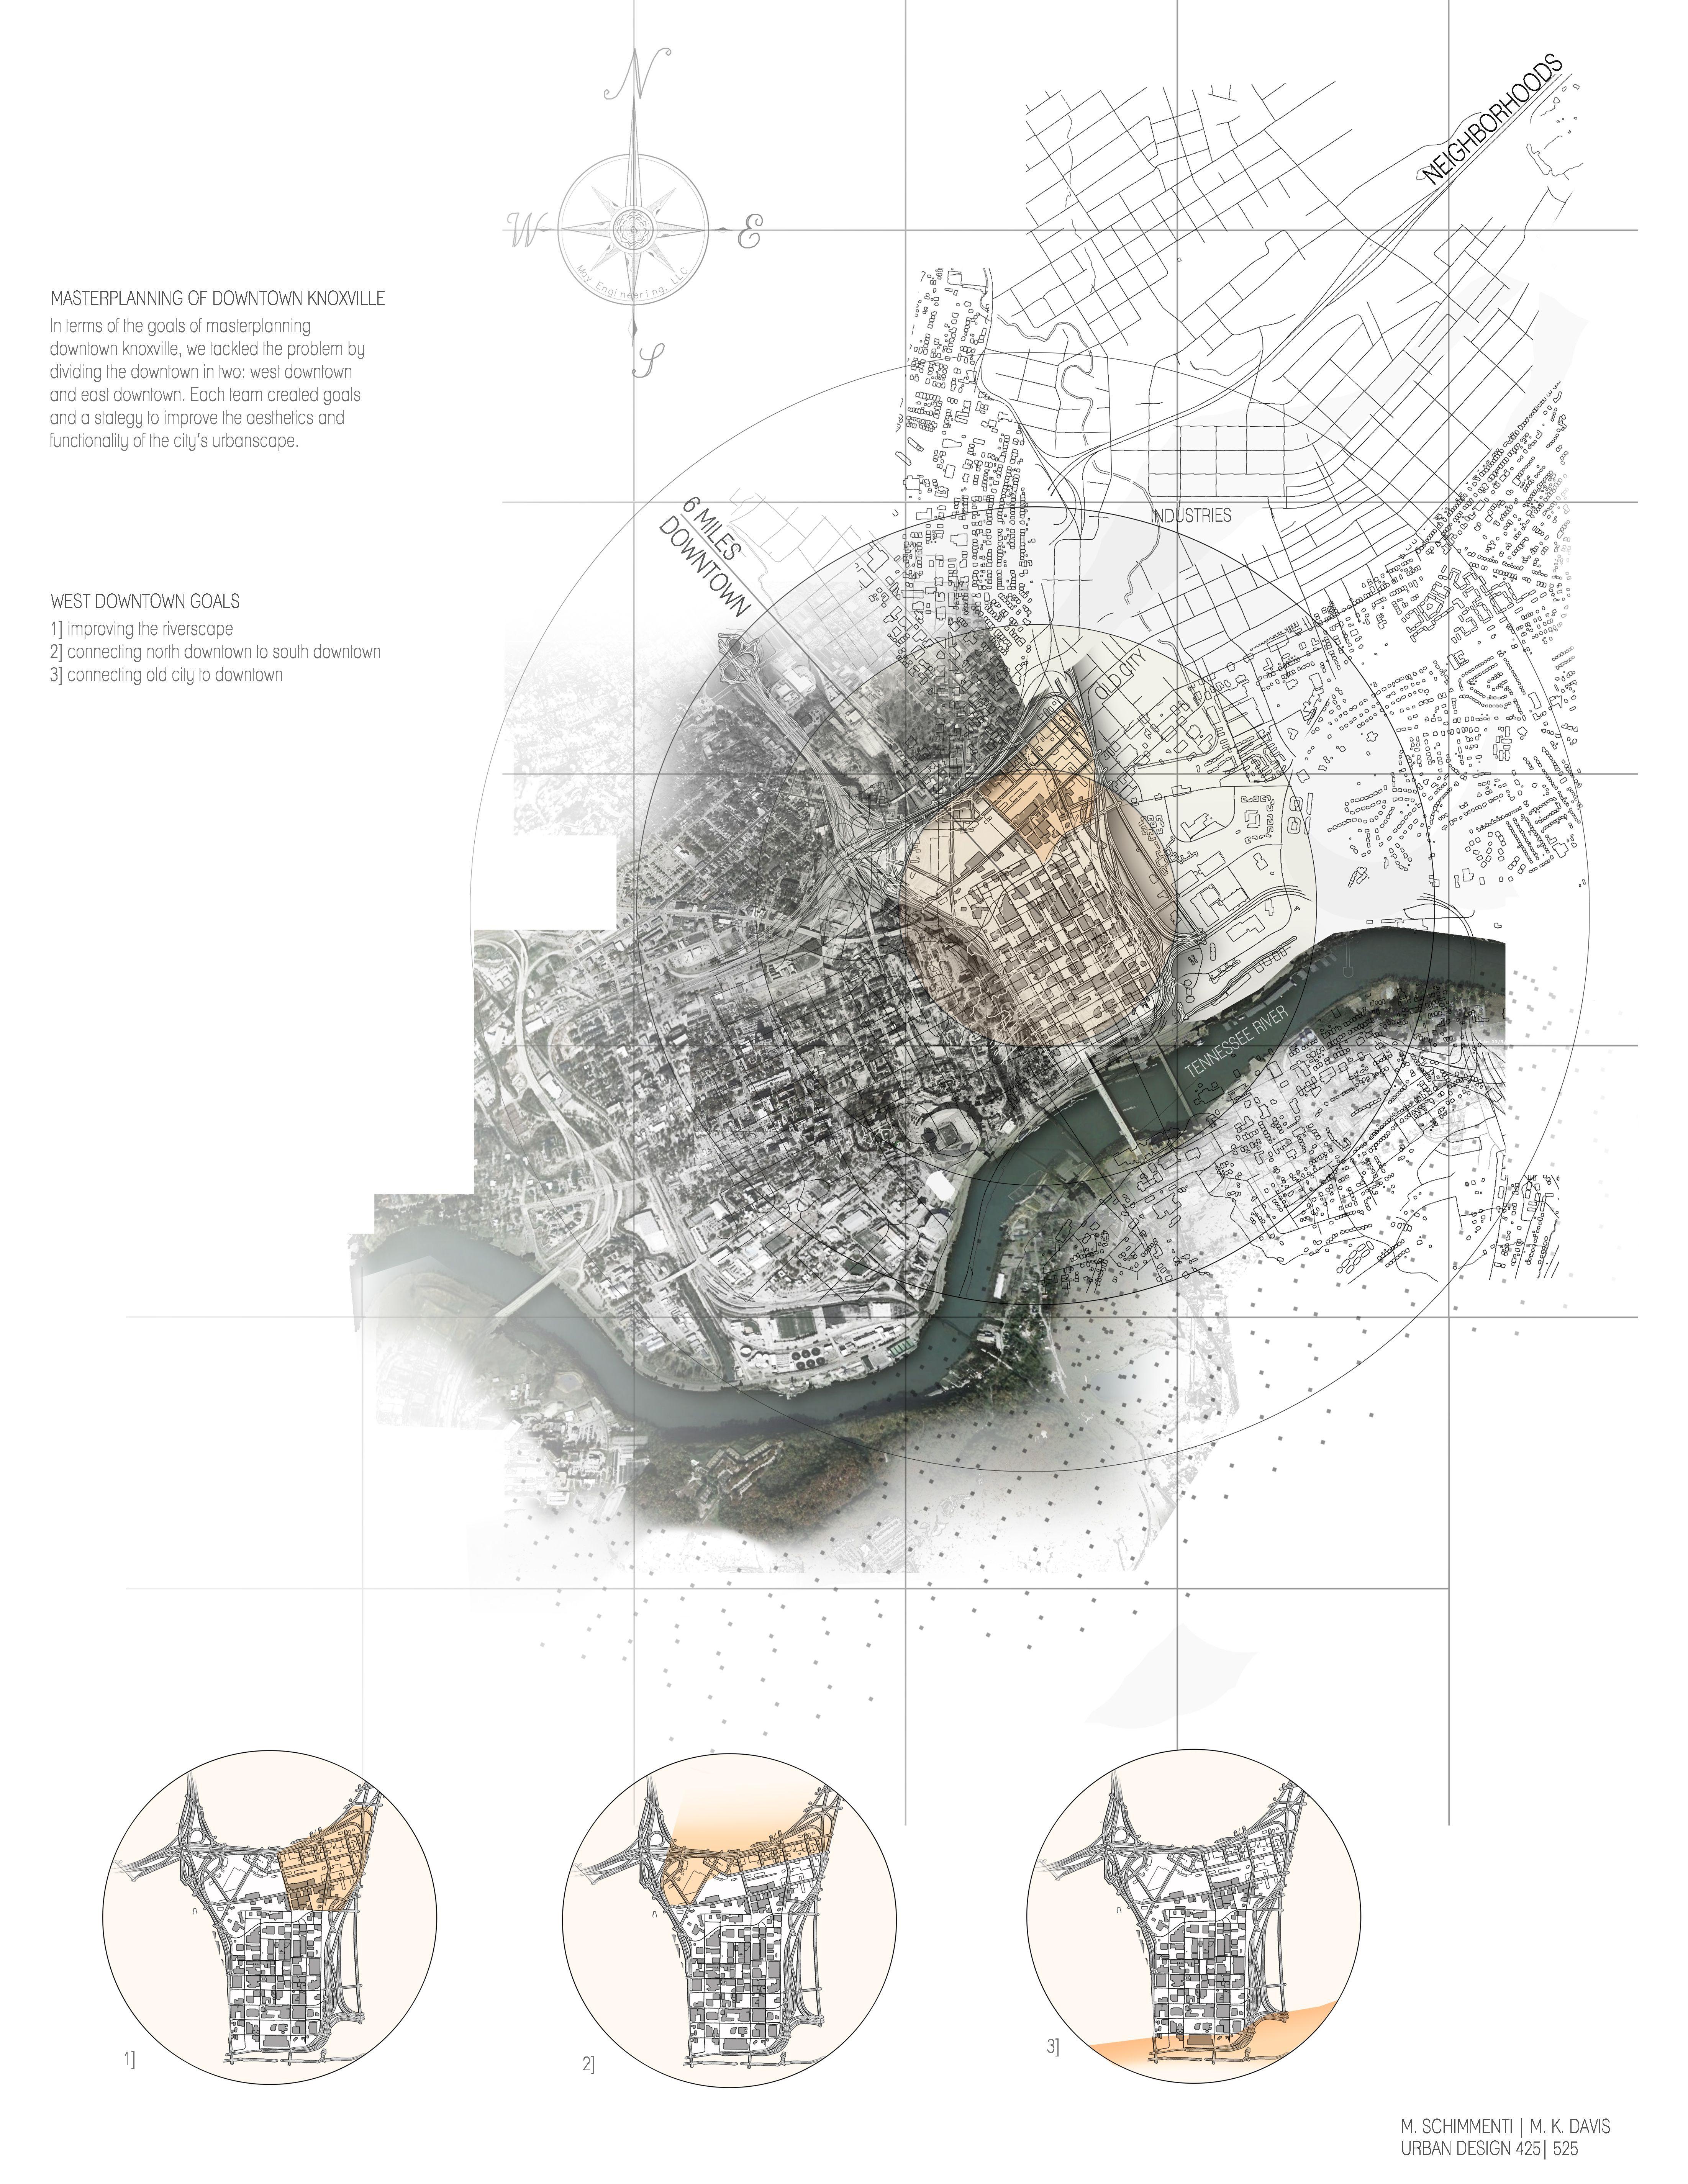 Knoxville Urban Design Map For Urban Design Class